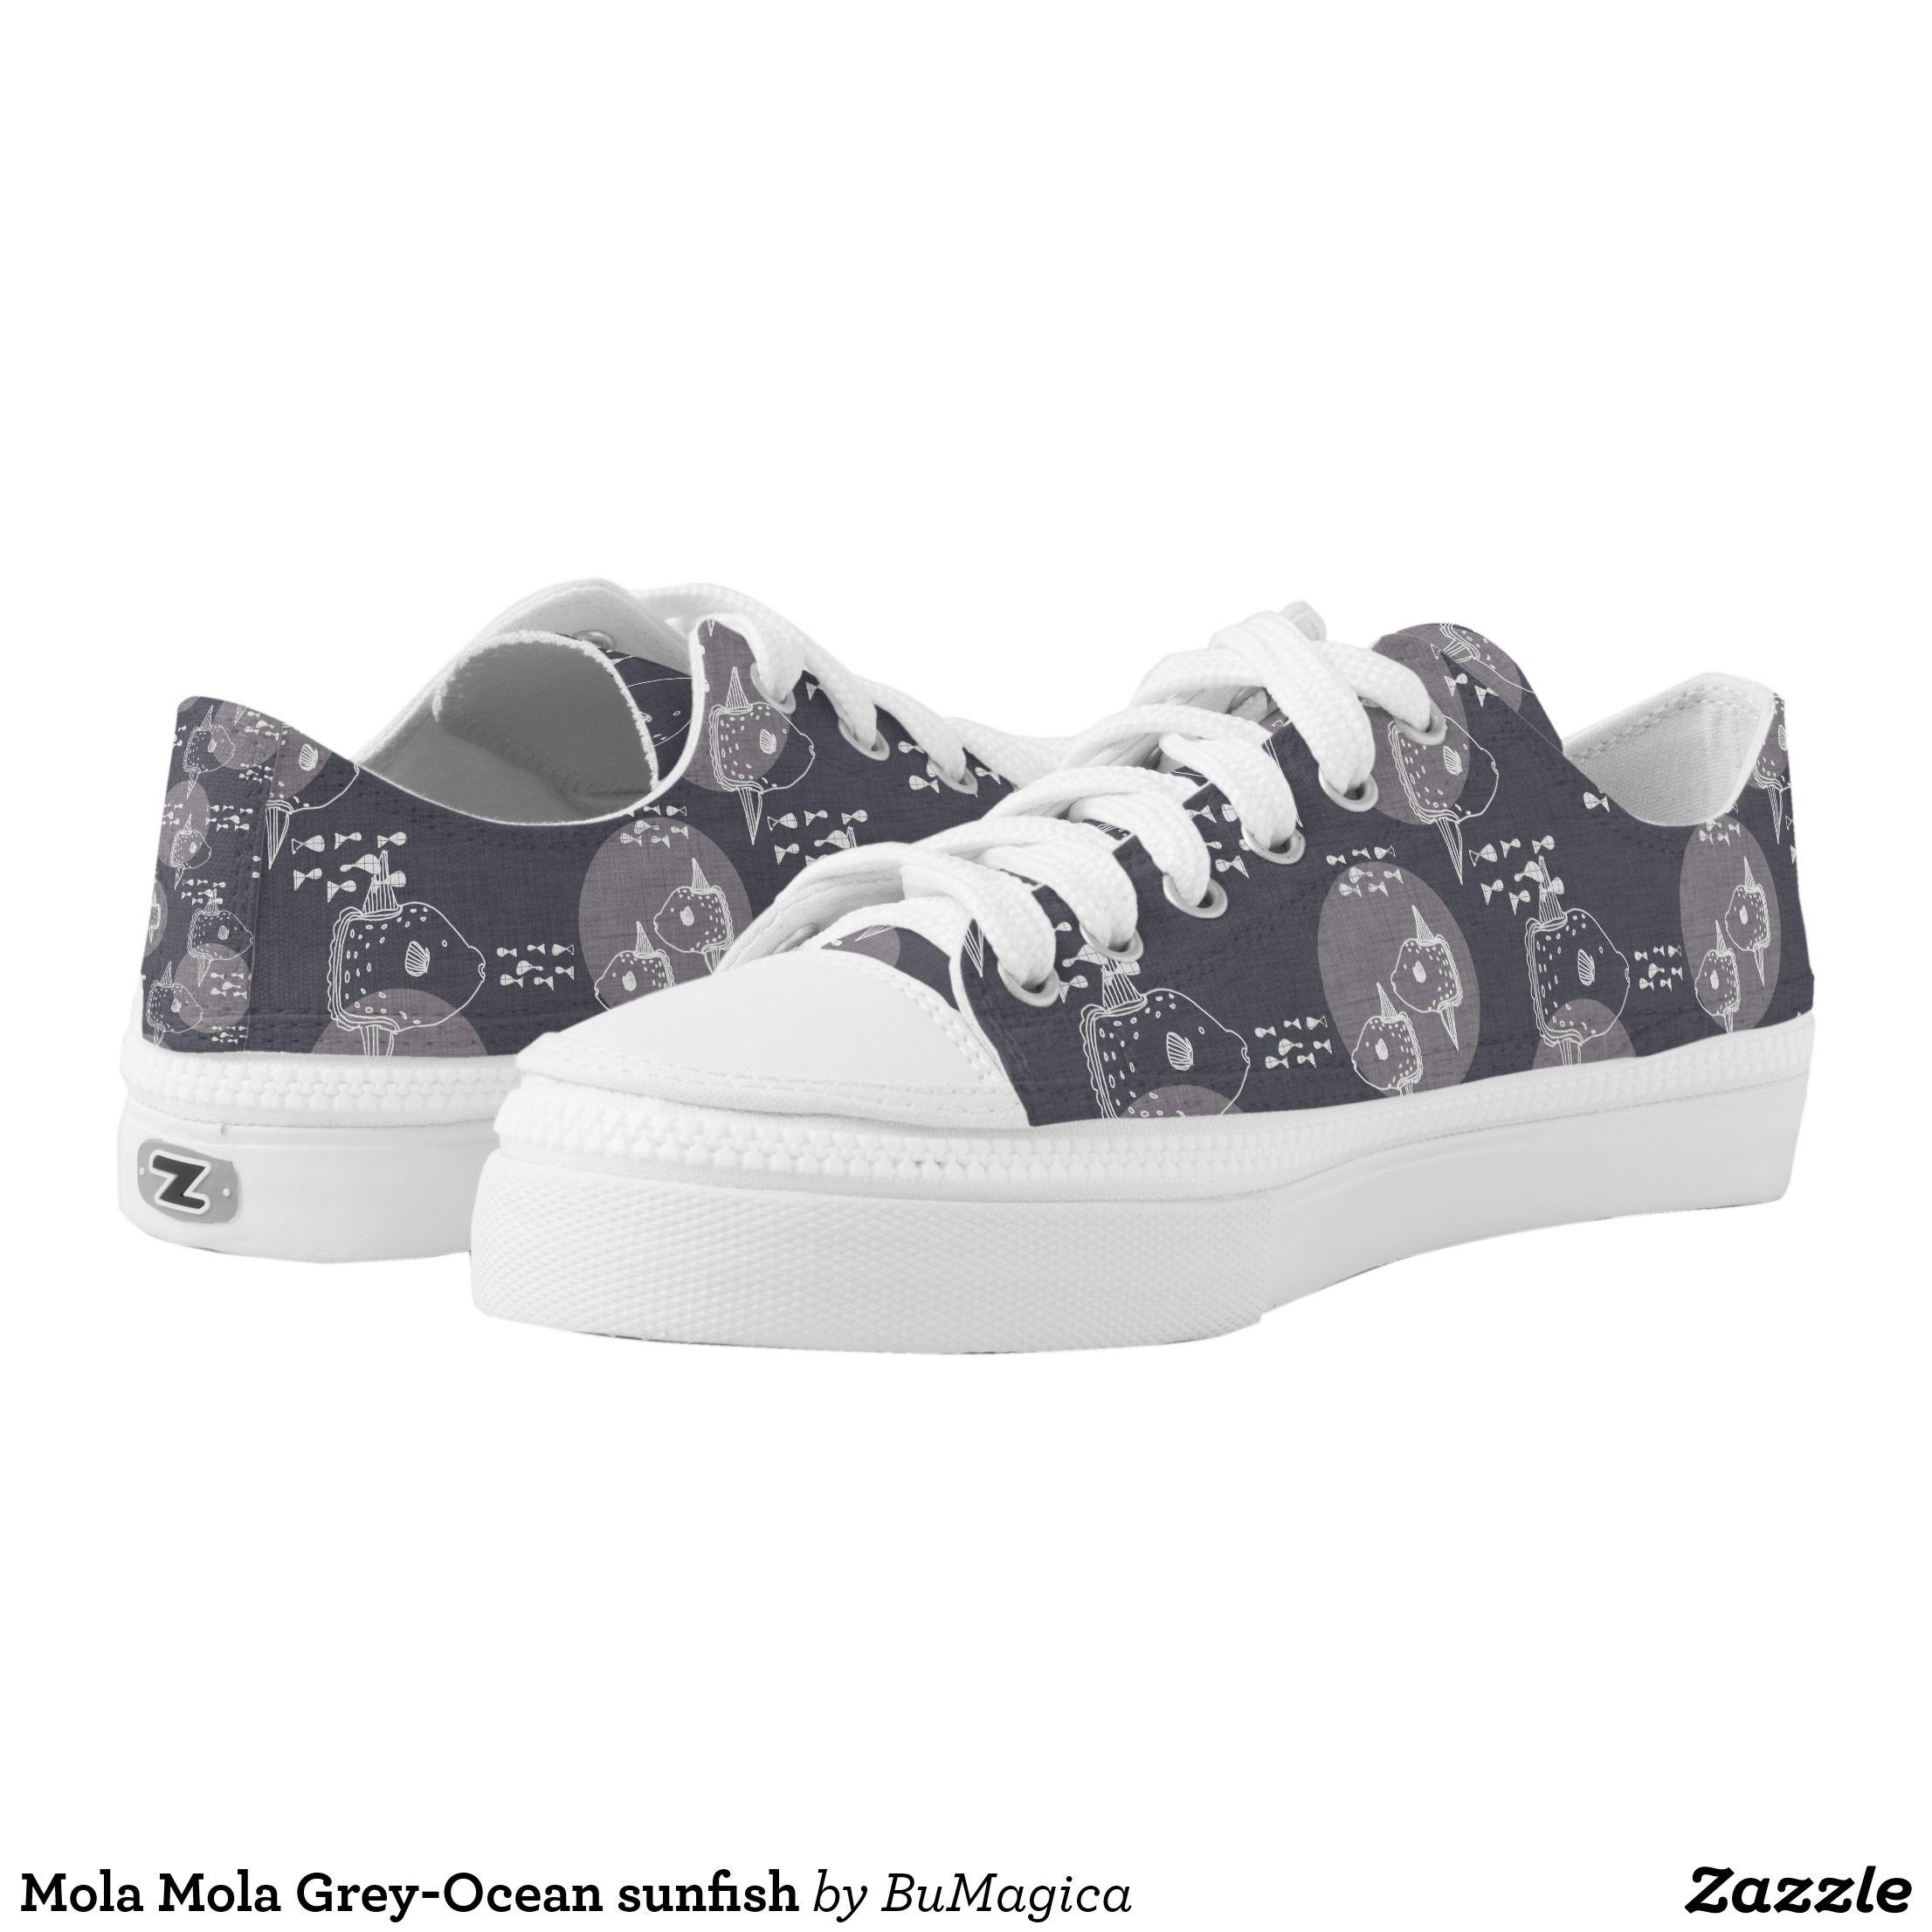 5f3dd6119fce Mola Mola Grey-Ocean sunfish Low-Top Sneakers - Canvas-Top Rubber-